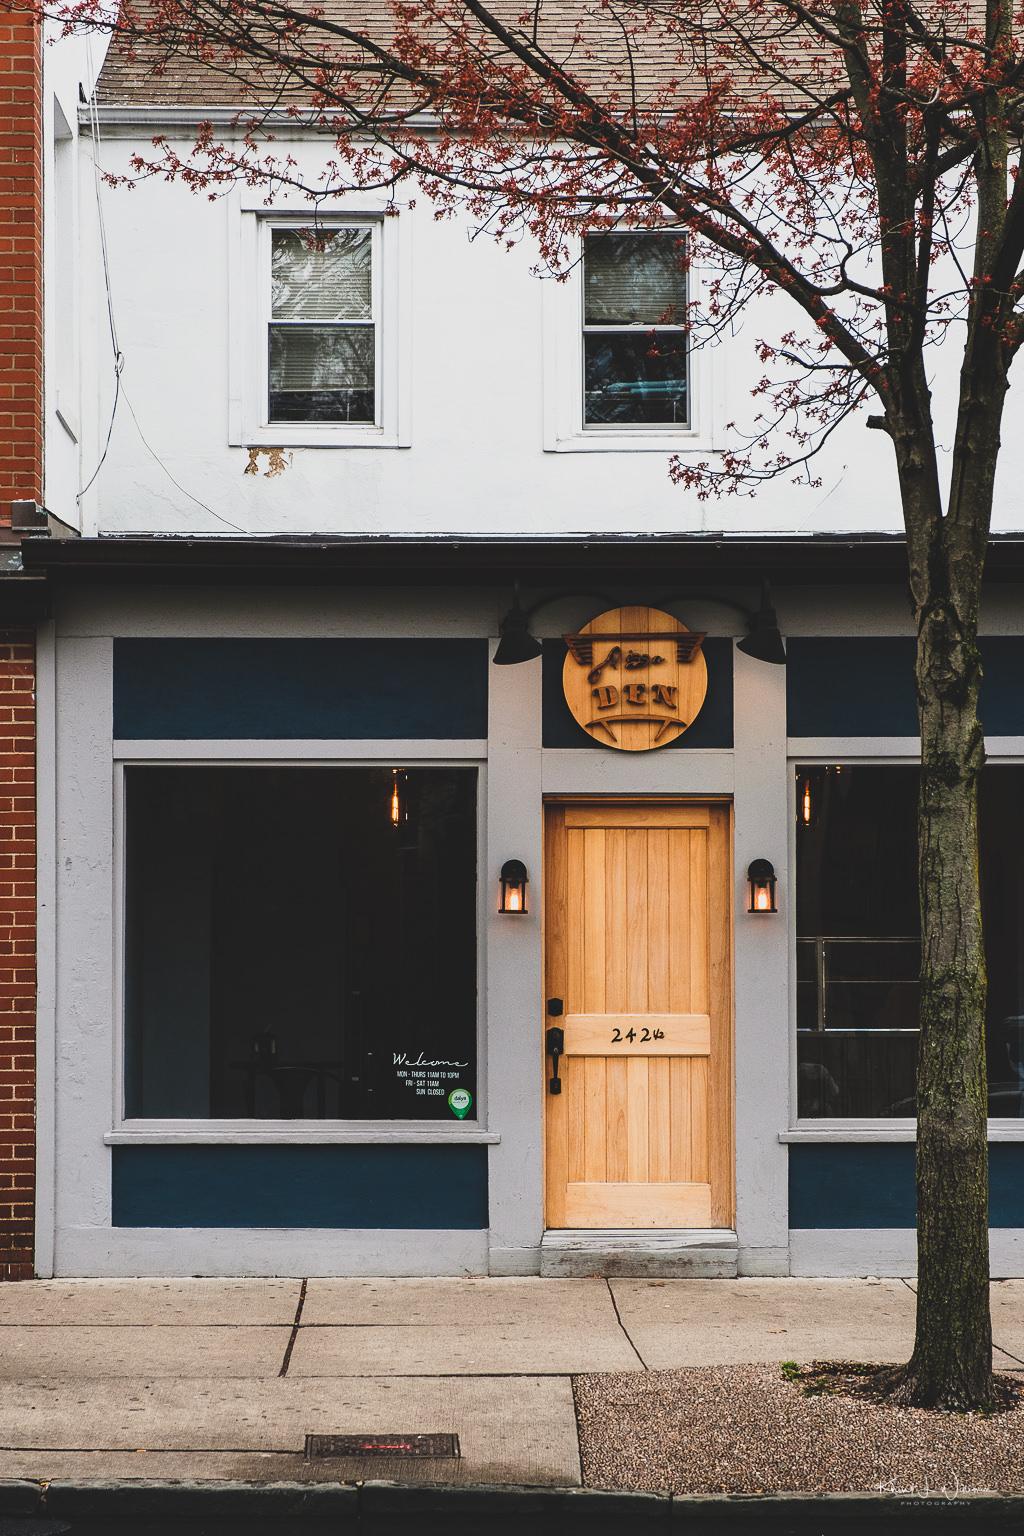 Den, Nassau Street, Princeton, New Jersey